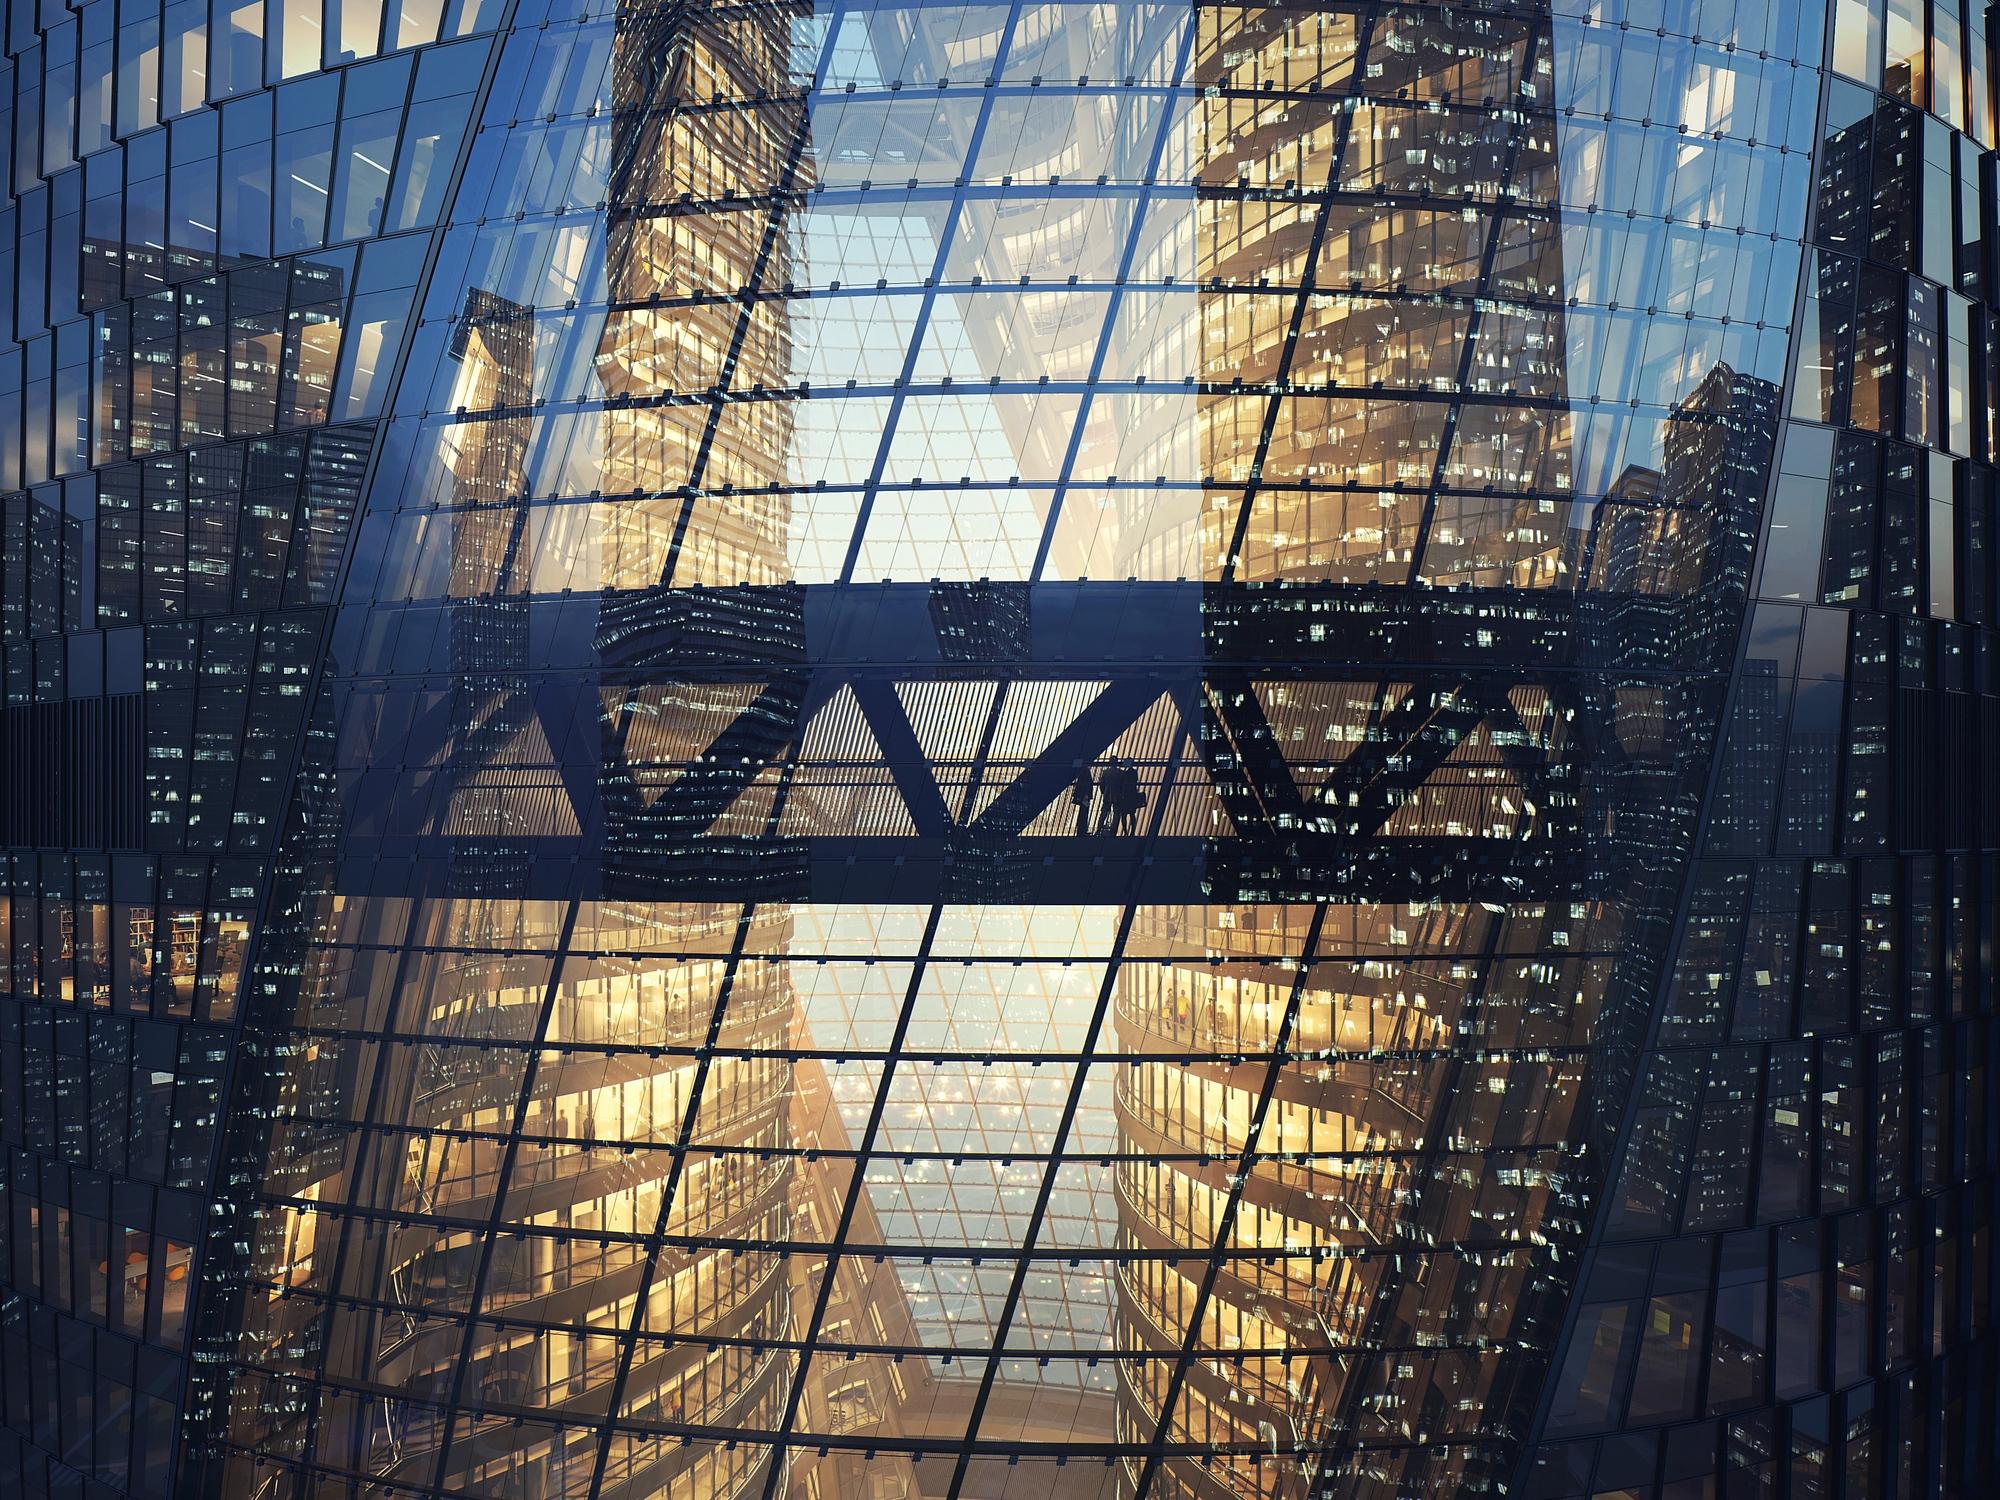 Fluid Luminosity The Architectural Lighting Of Zaha Hadid